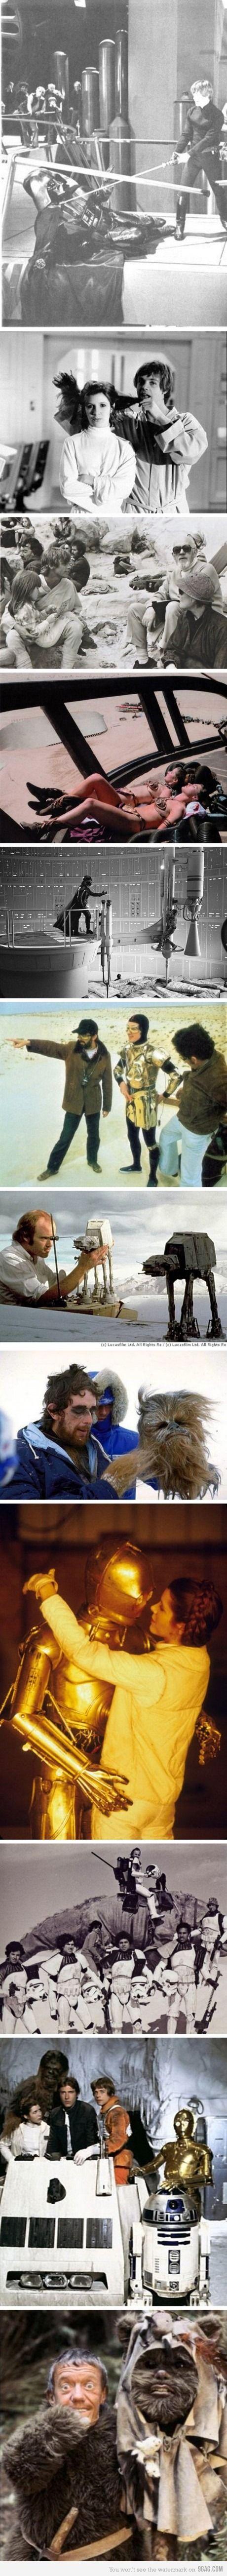 Star Wars Backstage Photos